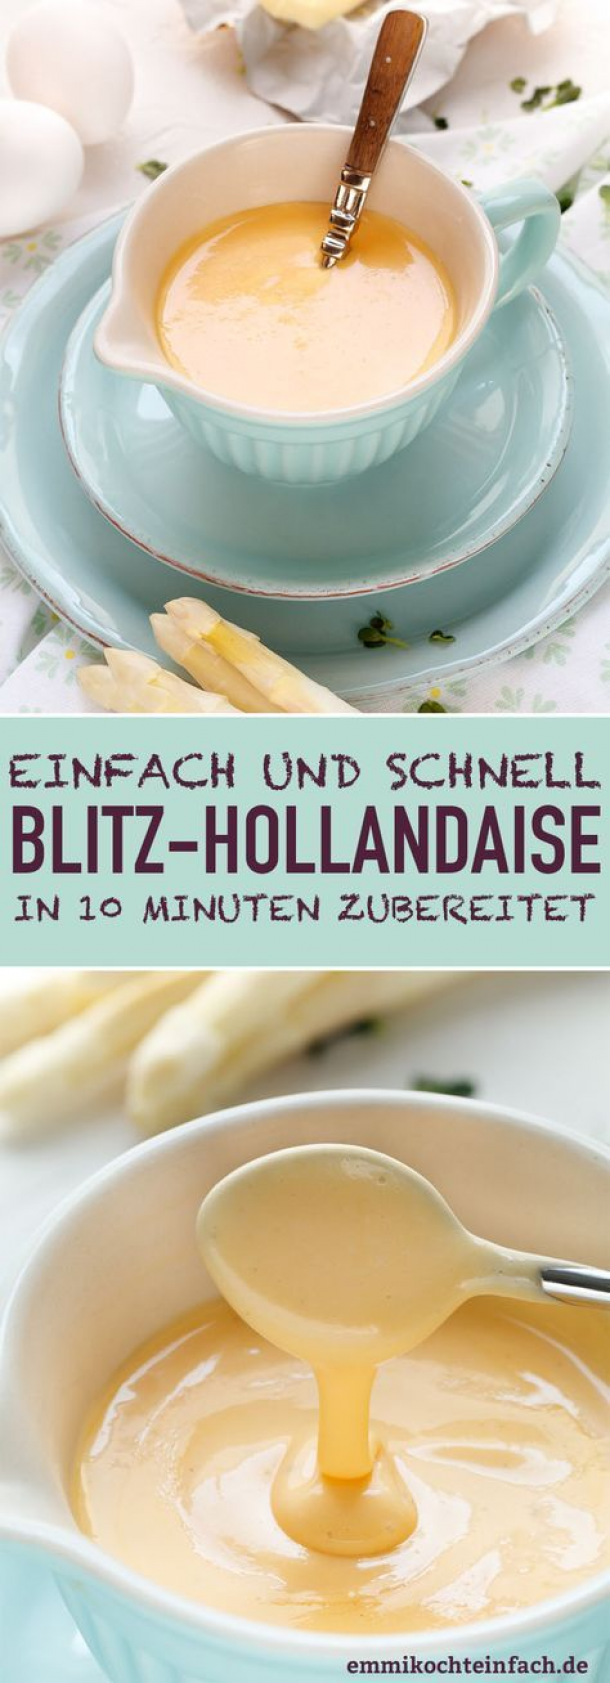 Blitz-Hollandaise - www.emmikochteinfach.de #paleodessert